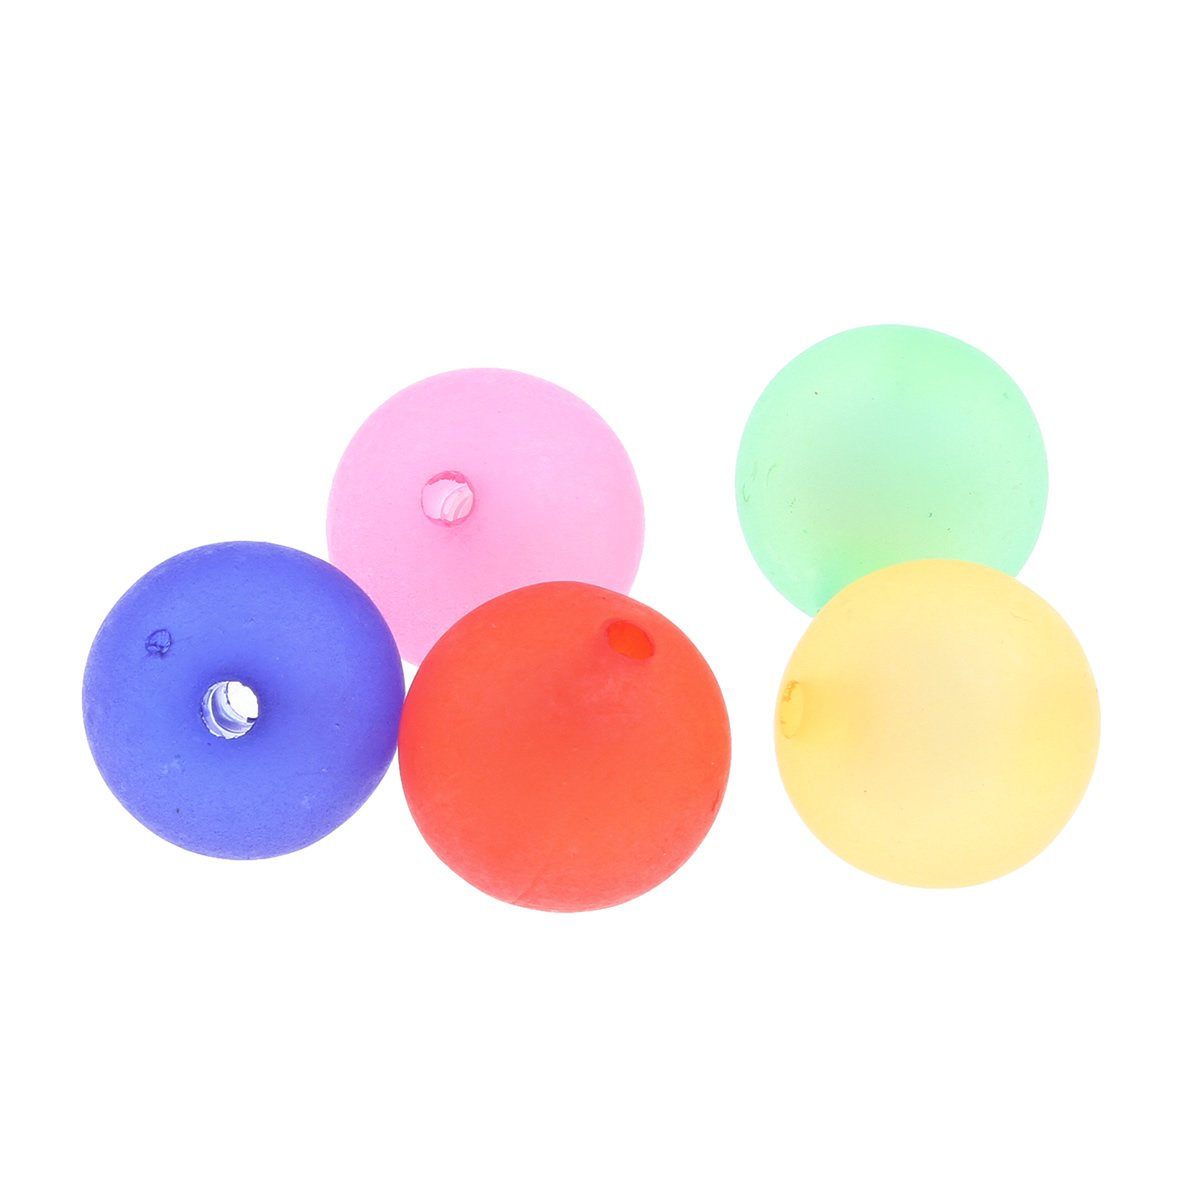 150 PERLEN Kunststoffperlen Acrylperlen Plastik KUGEL POLARIS EFFEKT 10mm R178 Perlin